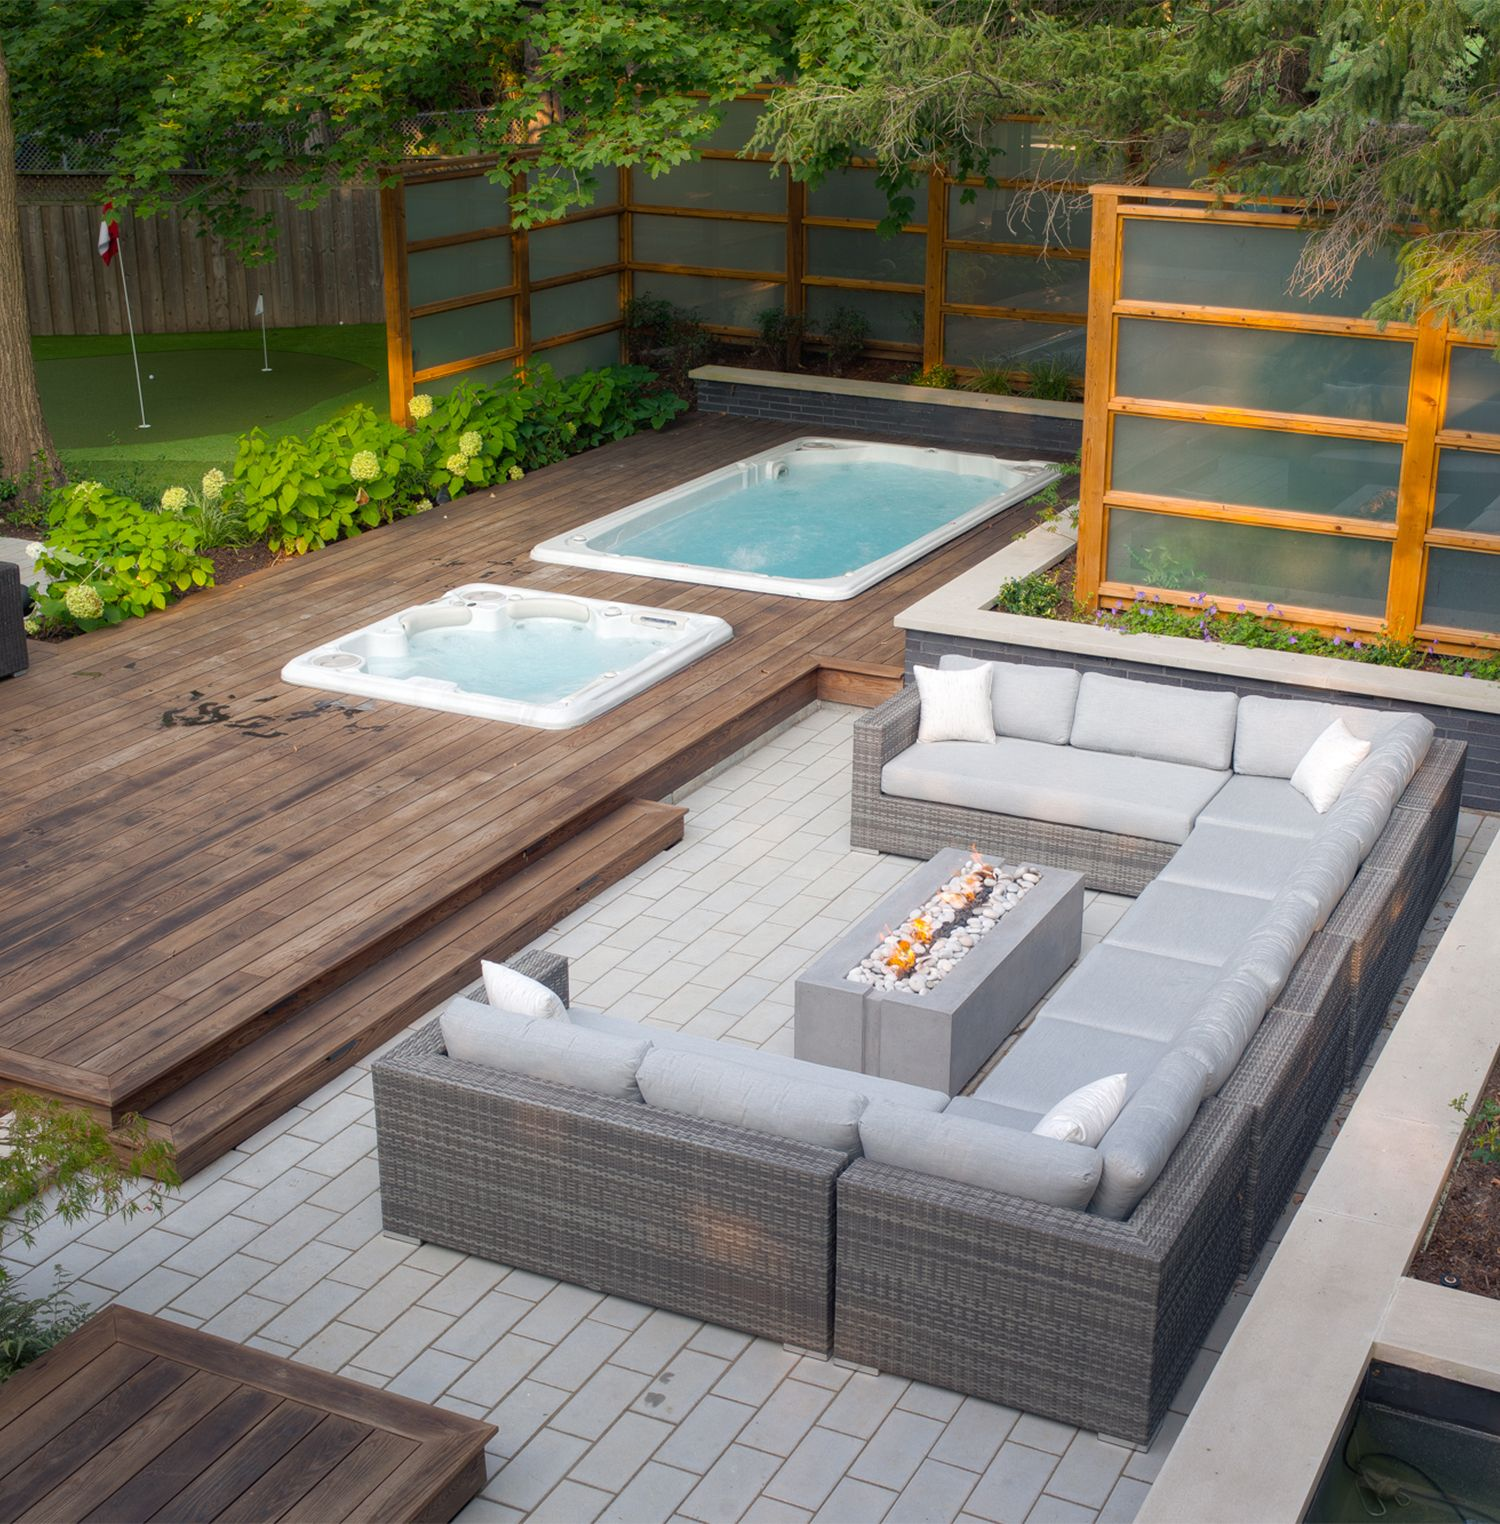 Models In 2019 Backyard Inground Hot Tub Cleaning Hot Tub